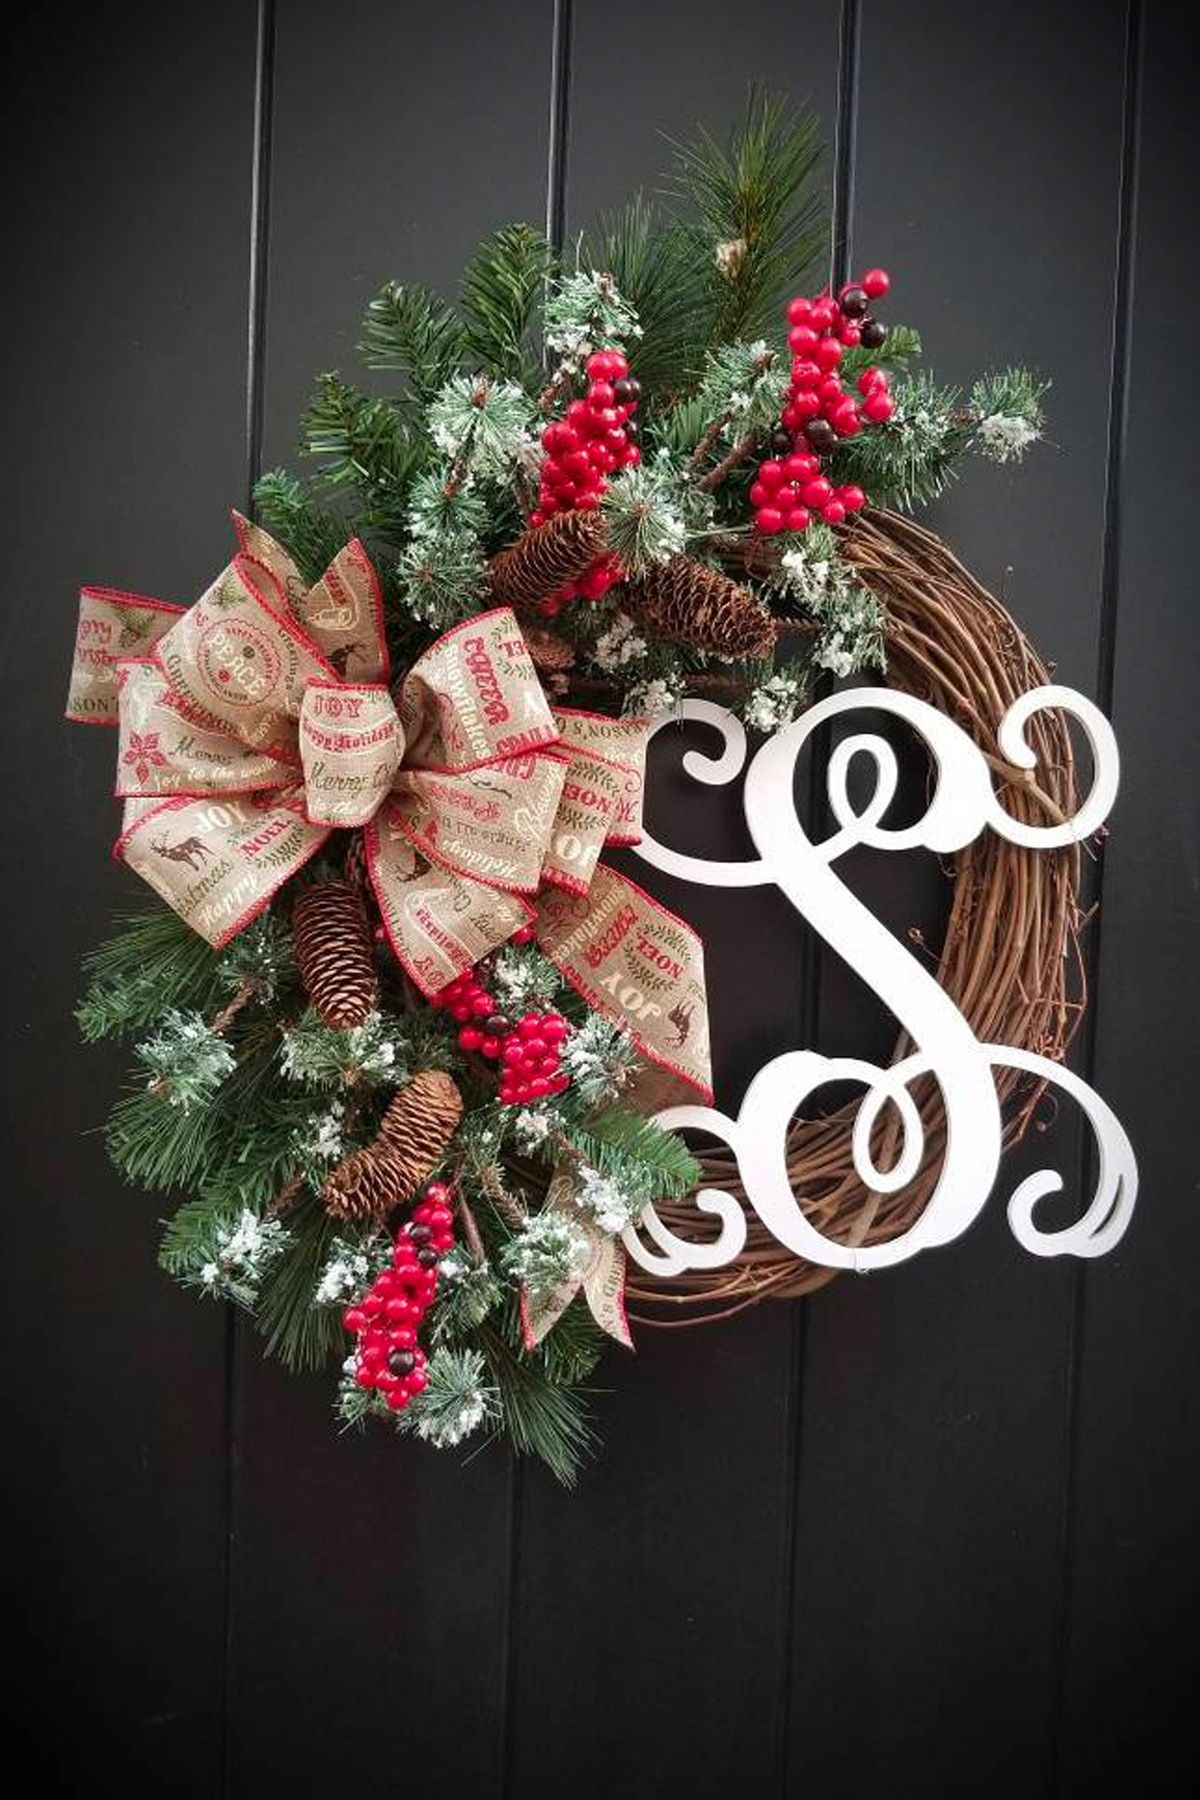 45 diy christmas wreath ideas how to make a homemade holiday wreath womansdaycom